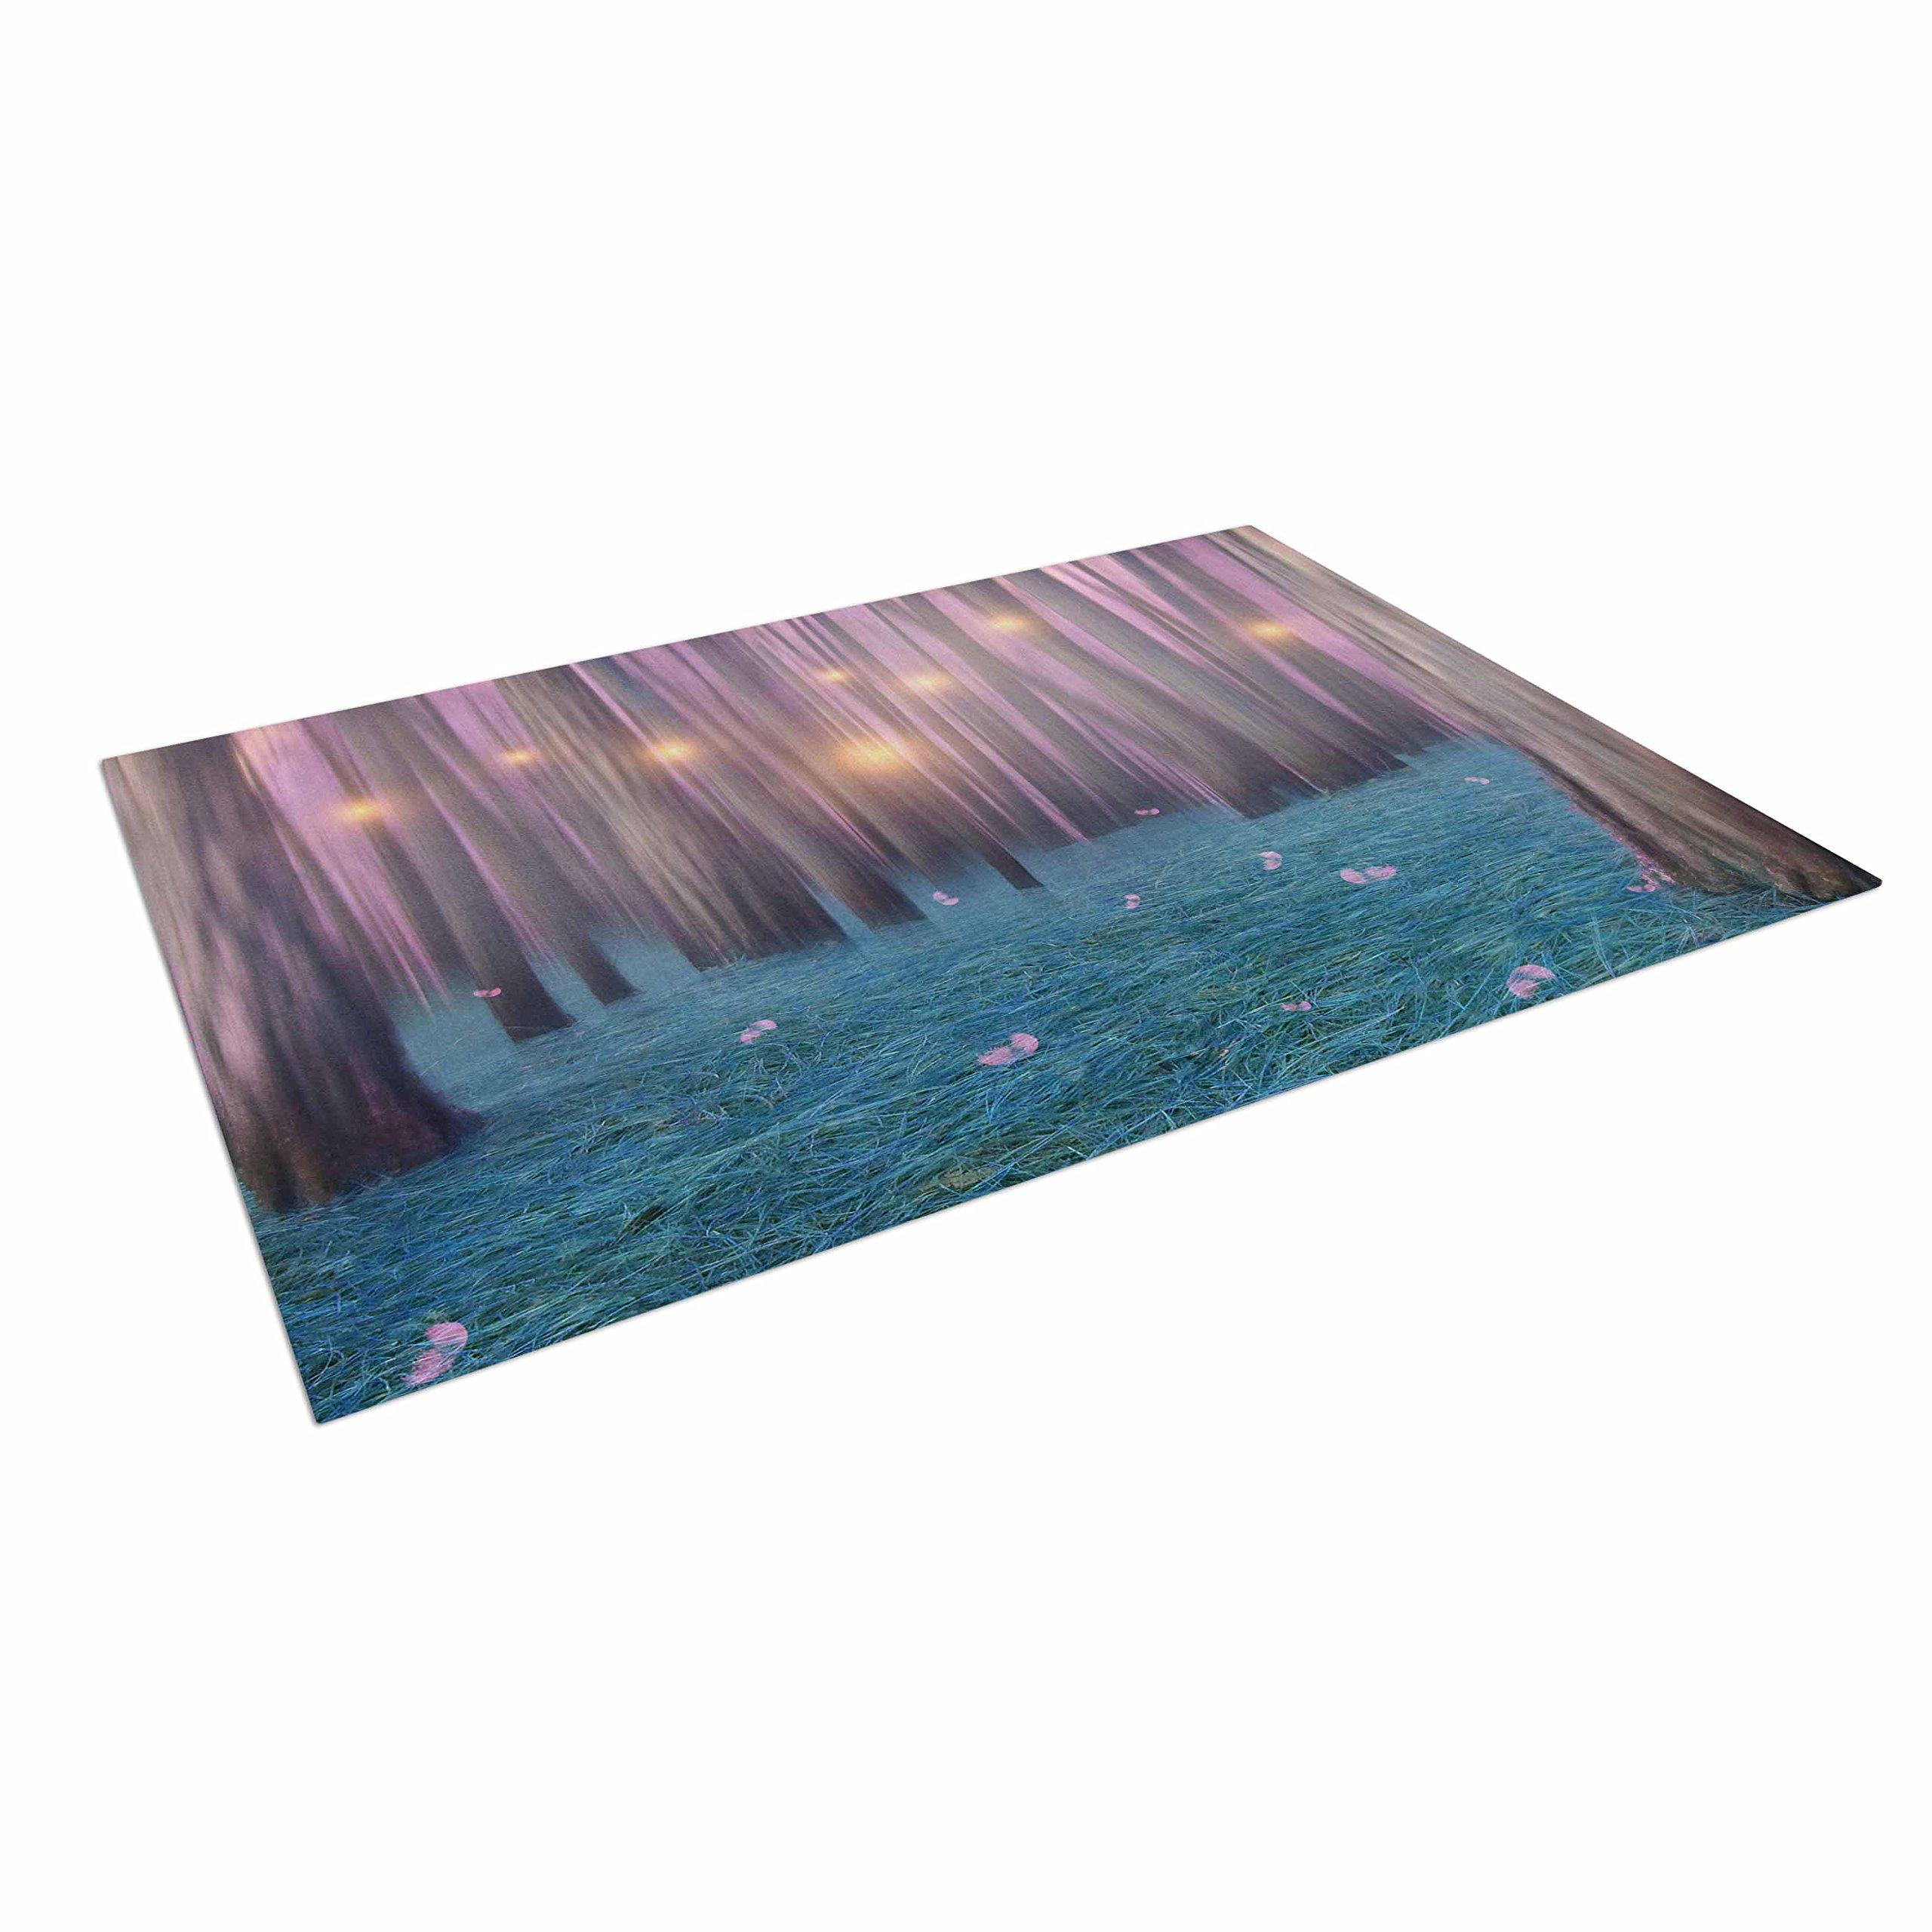 KESS InHouse Viviana Gonzalez ''Pink Feather Dance'' Digital Blue Outdoor Floor Mat, 4' x 5'